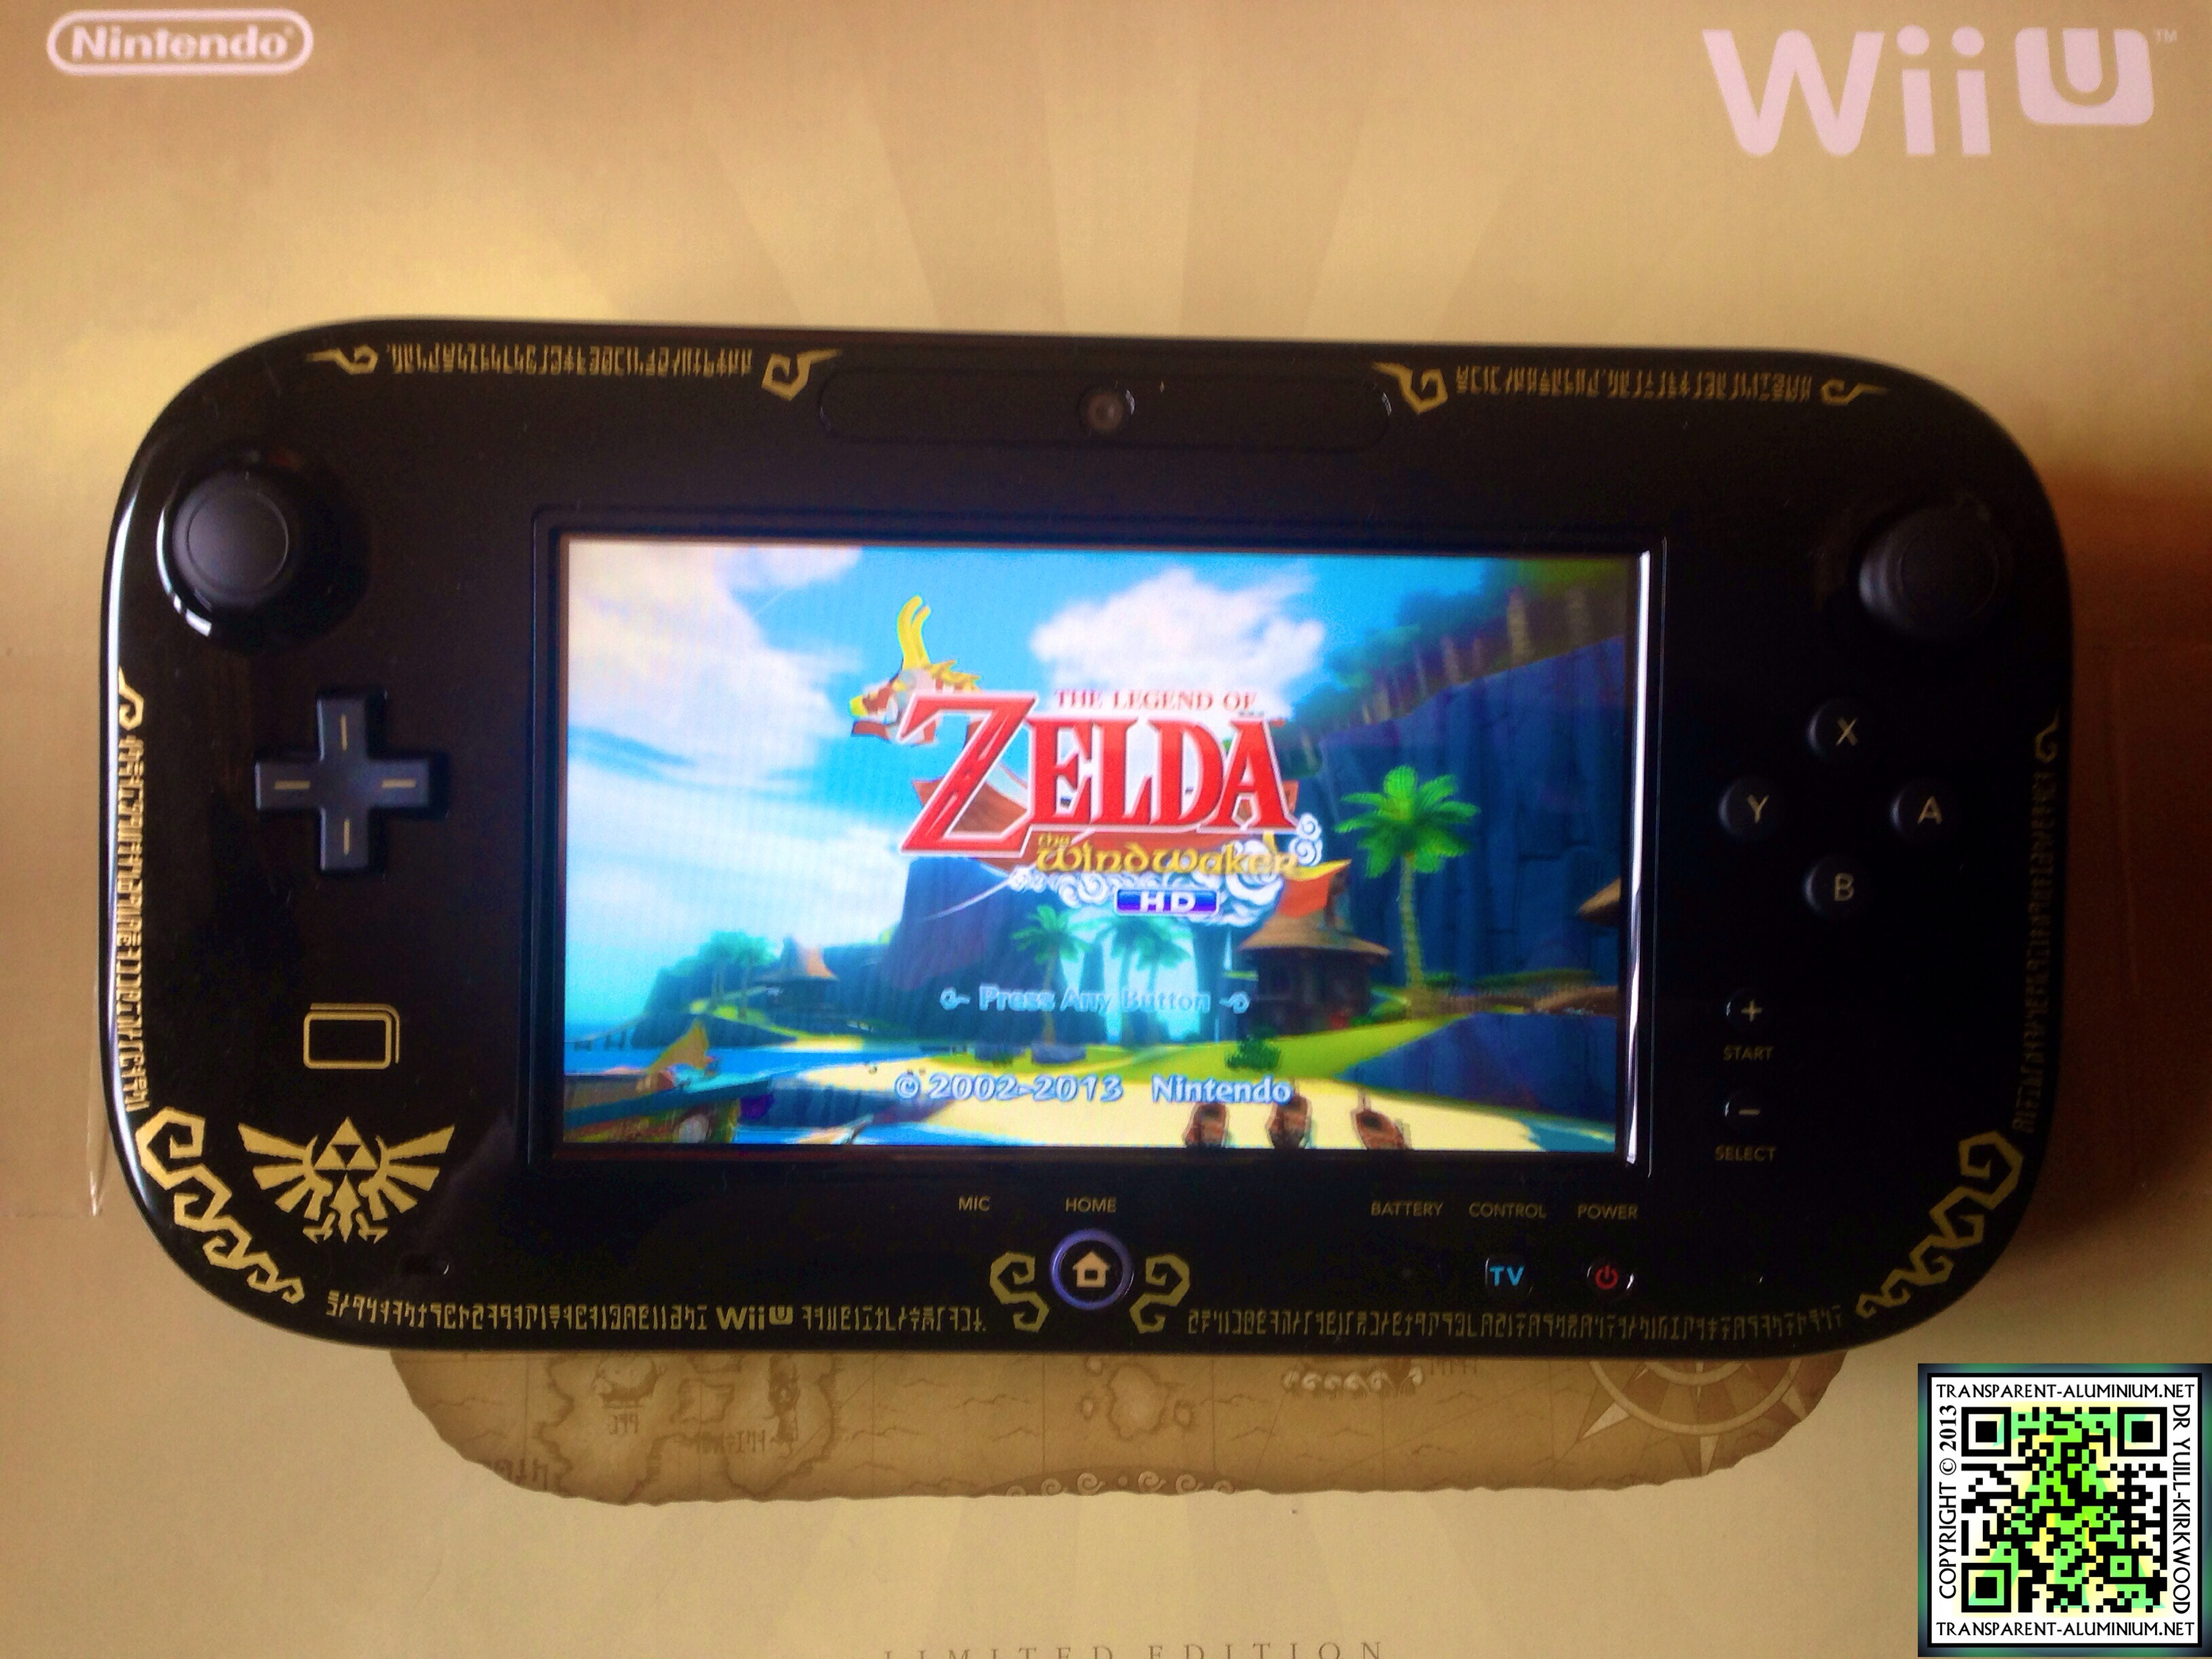 Wii U The Legend Of Zelda The Wind Waker Hd Edition